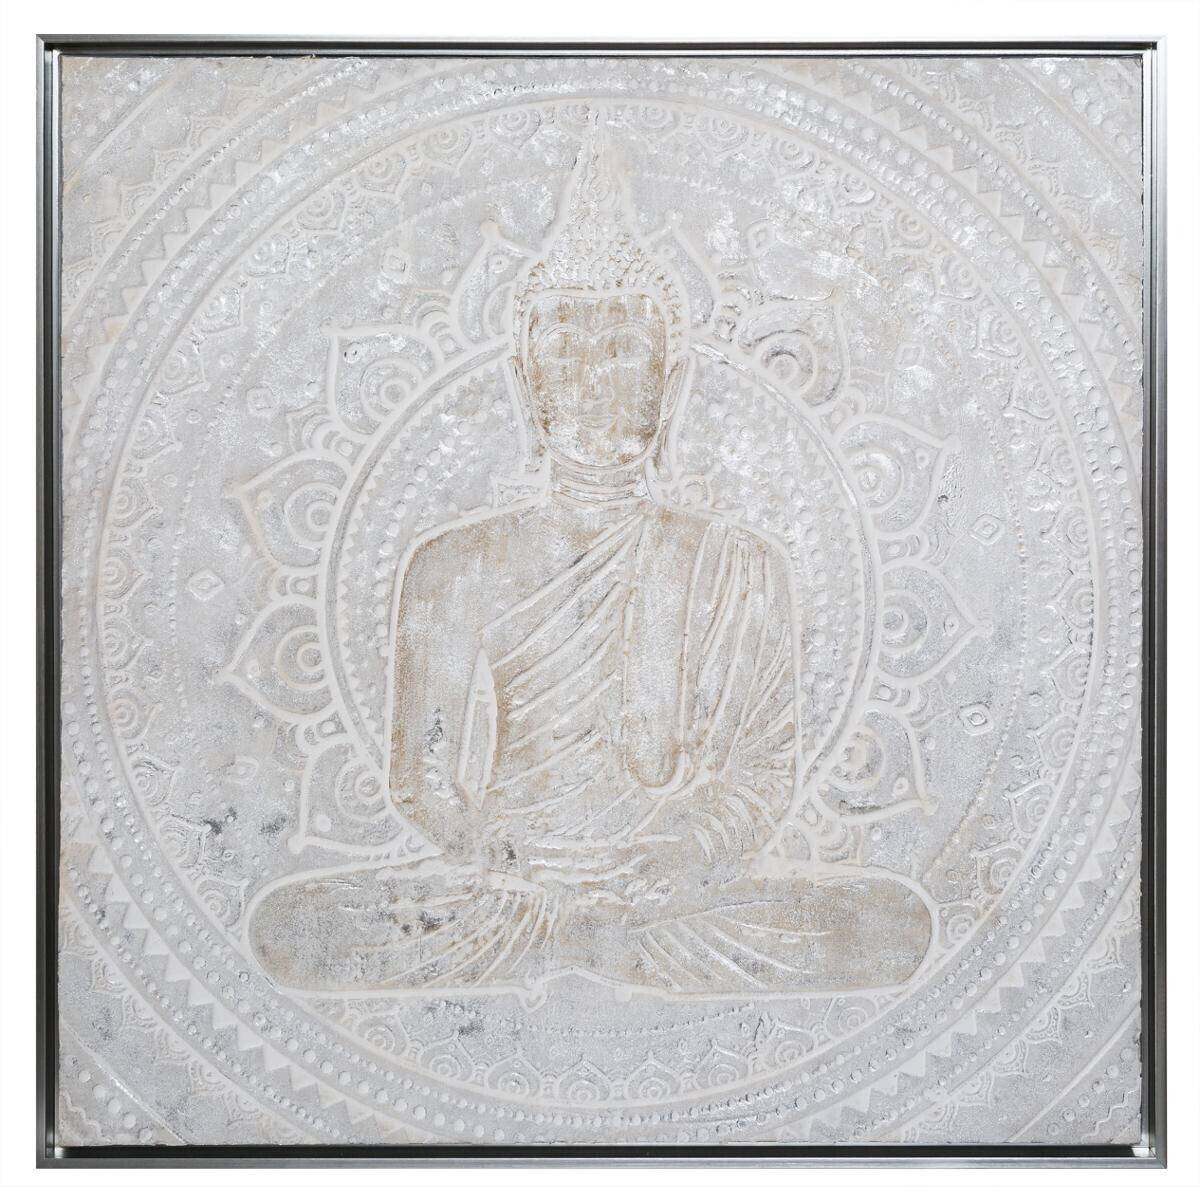 Atmosphera Toile peinte argentée encadrée Bouddha 78x78